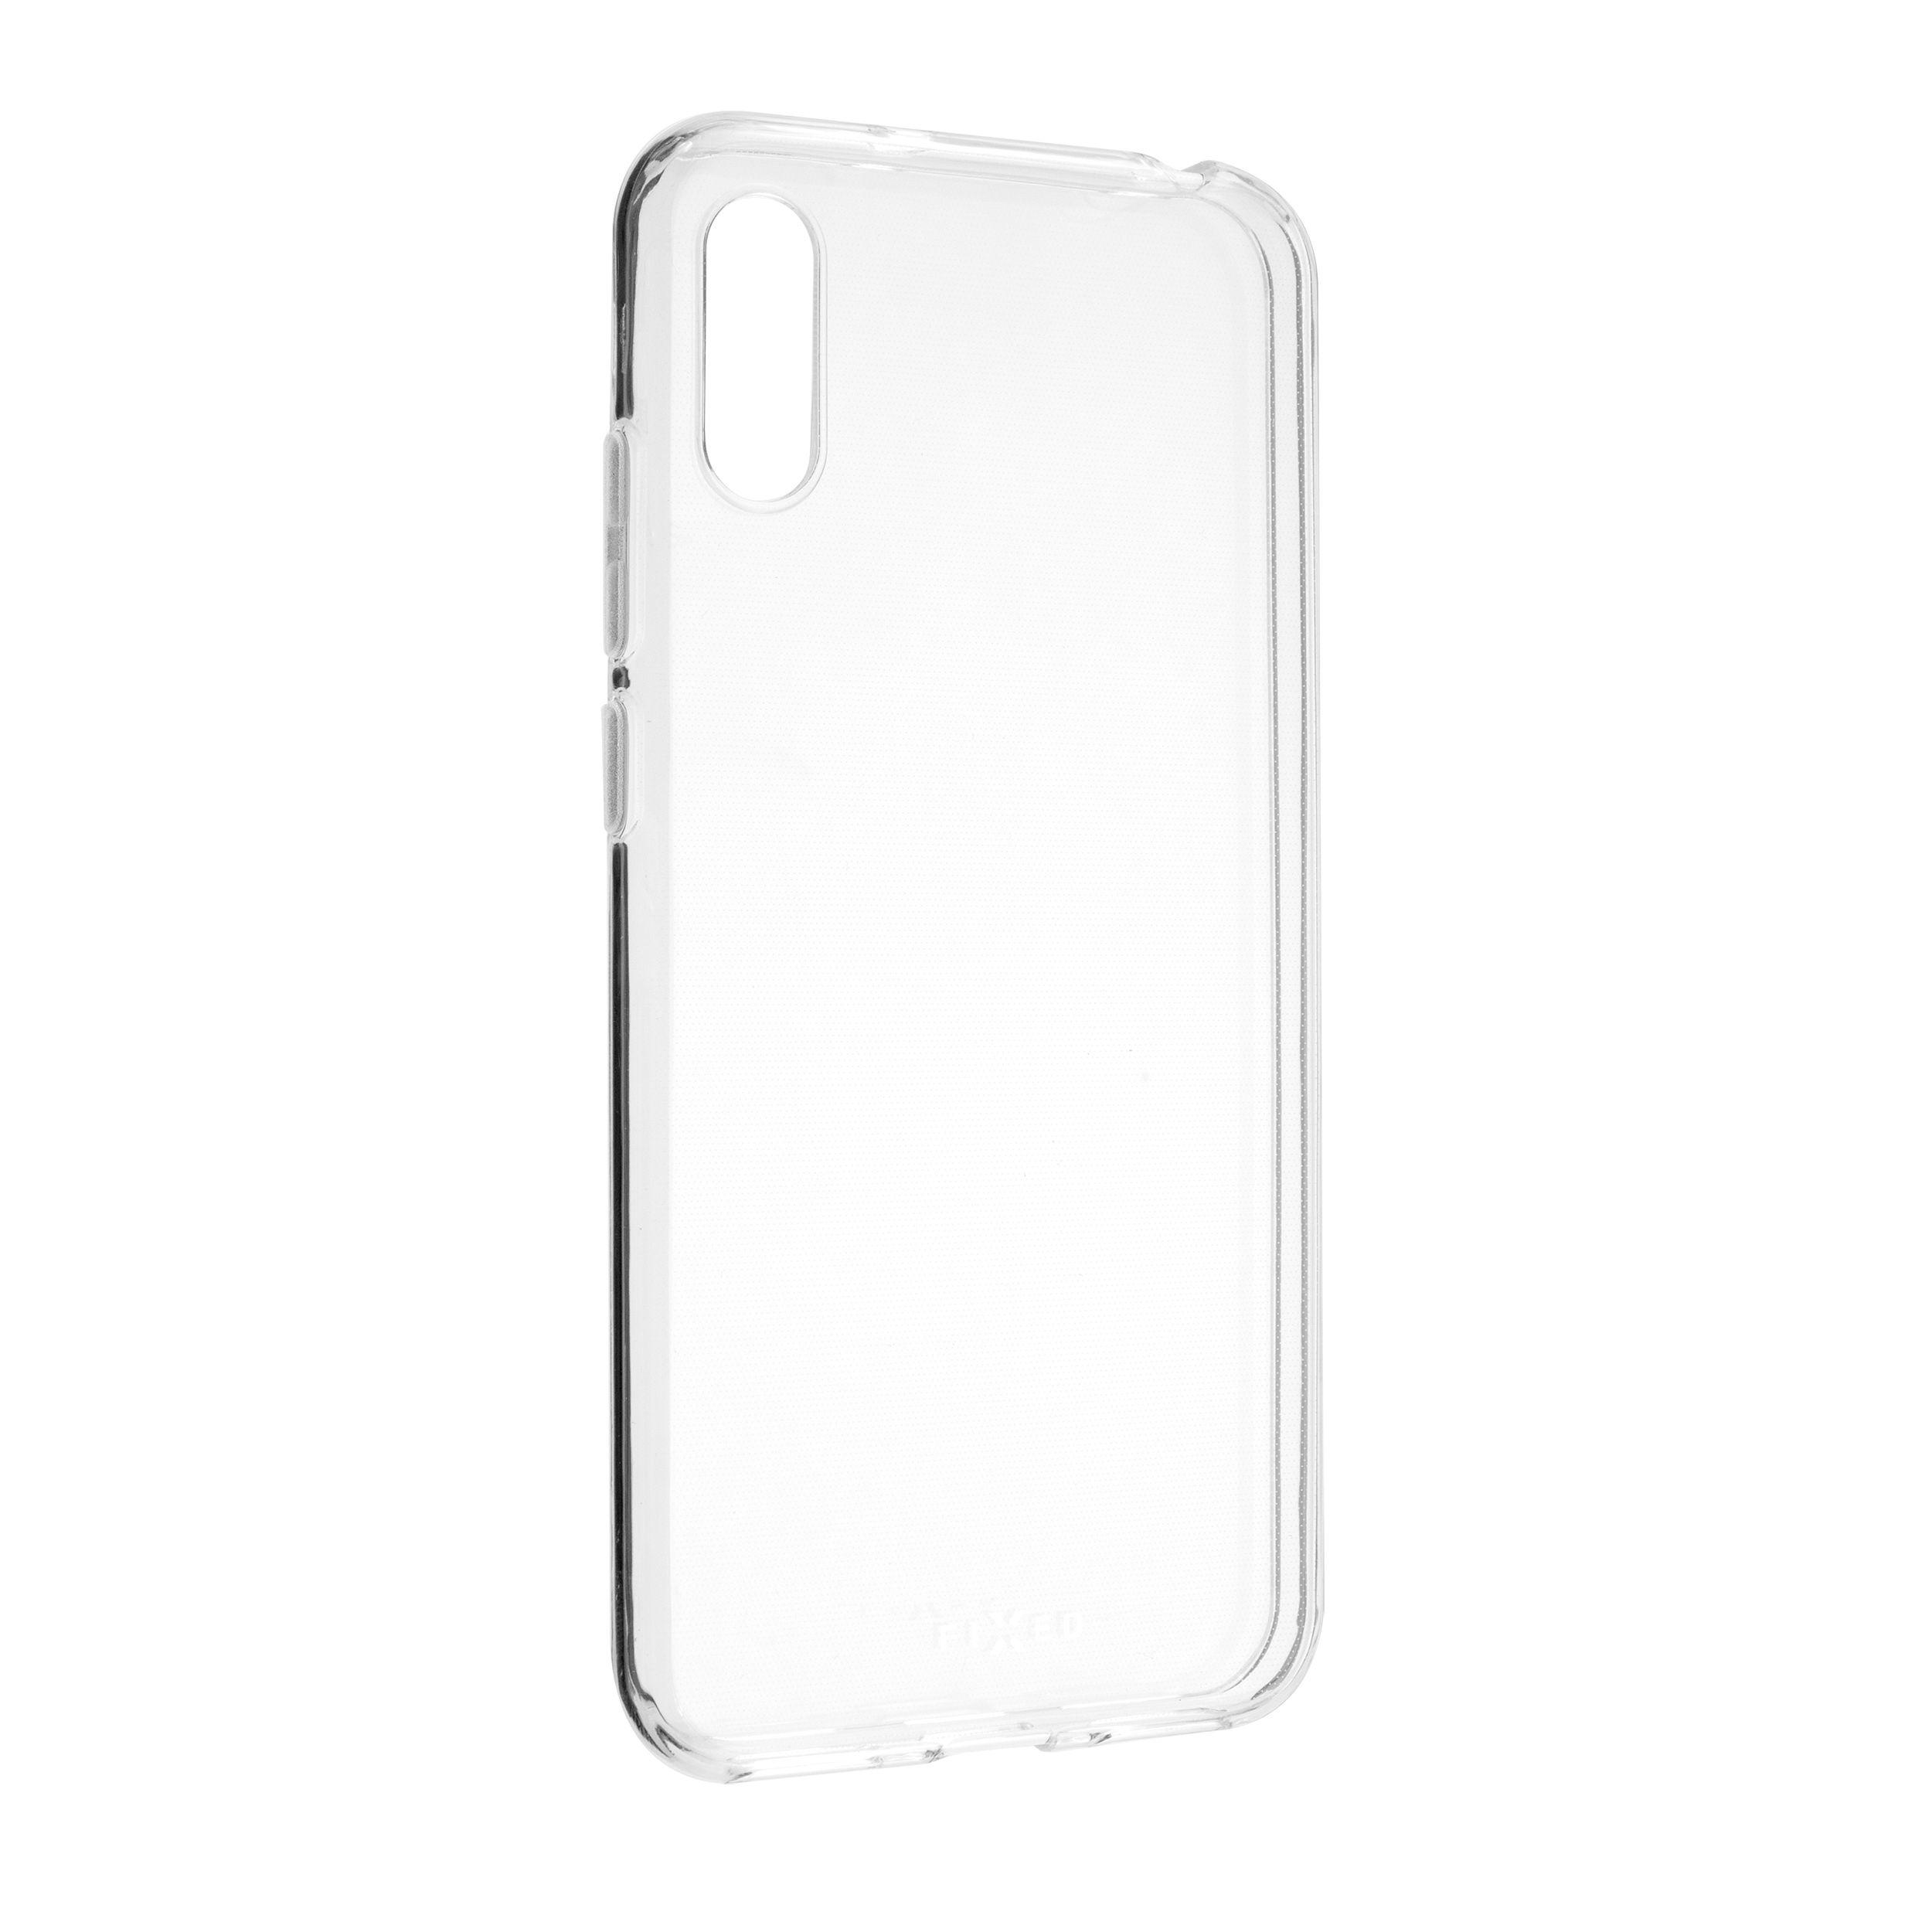 TPU gelové pouzdro FIXED pro Huawei Y6 (2019), čiré